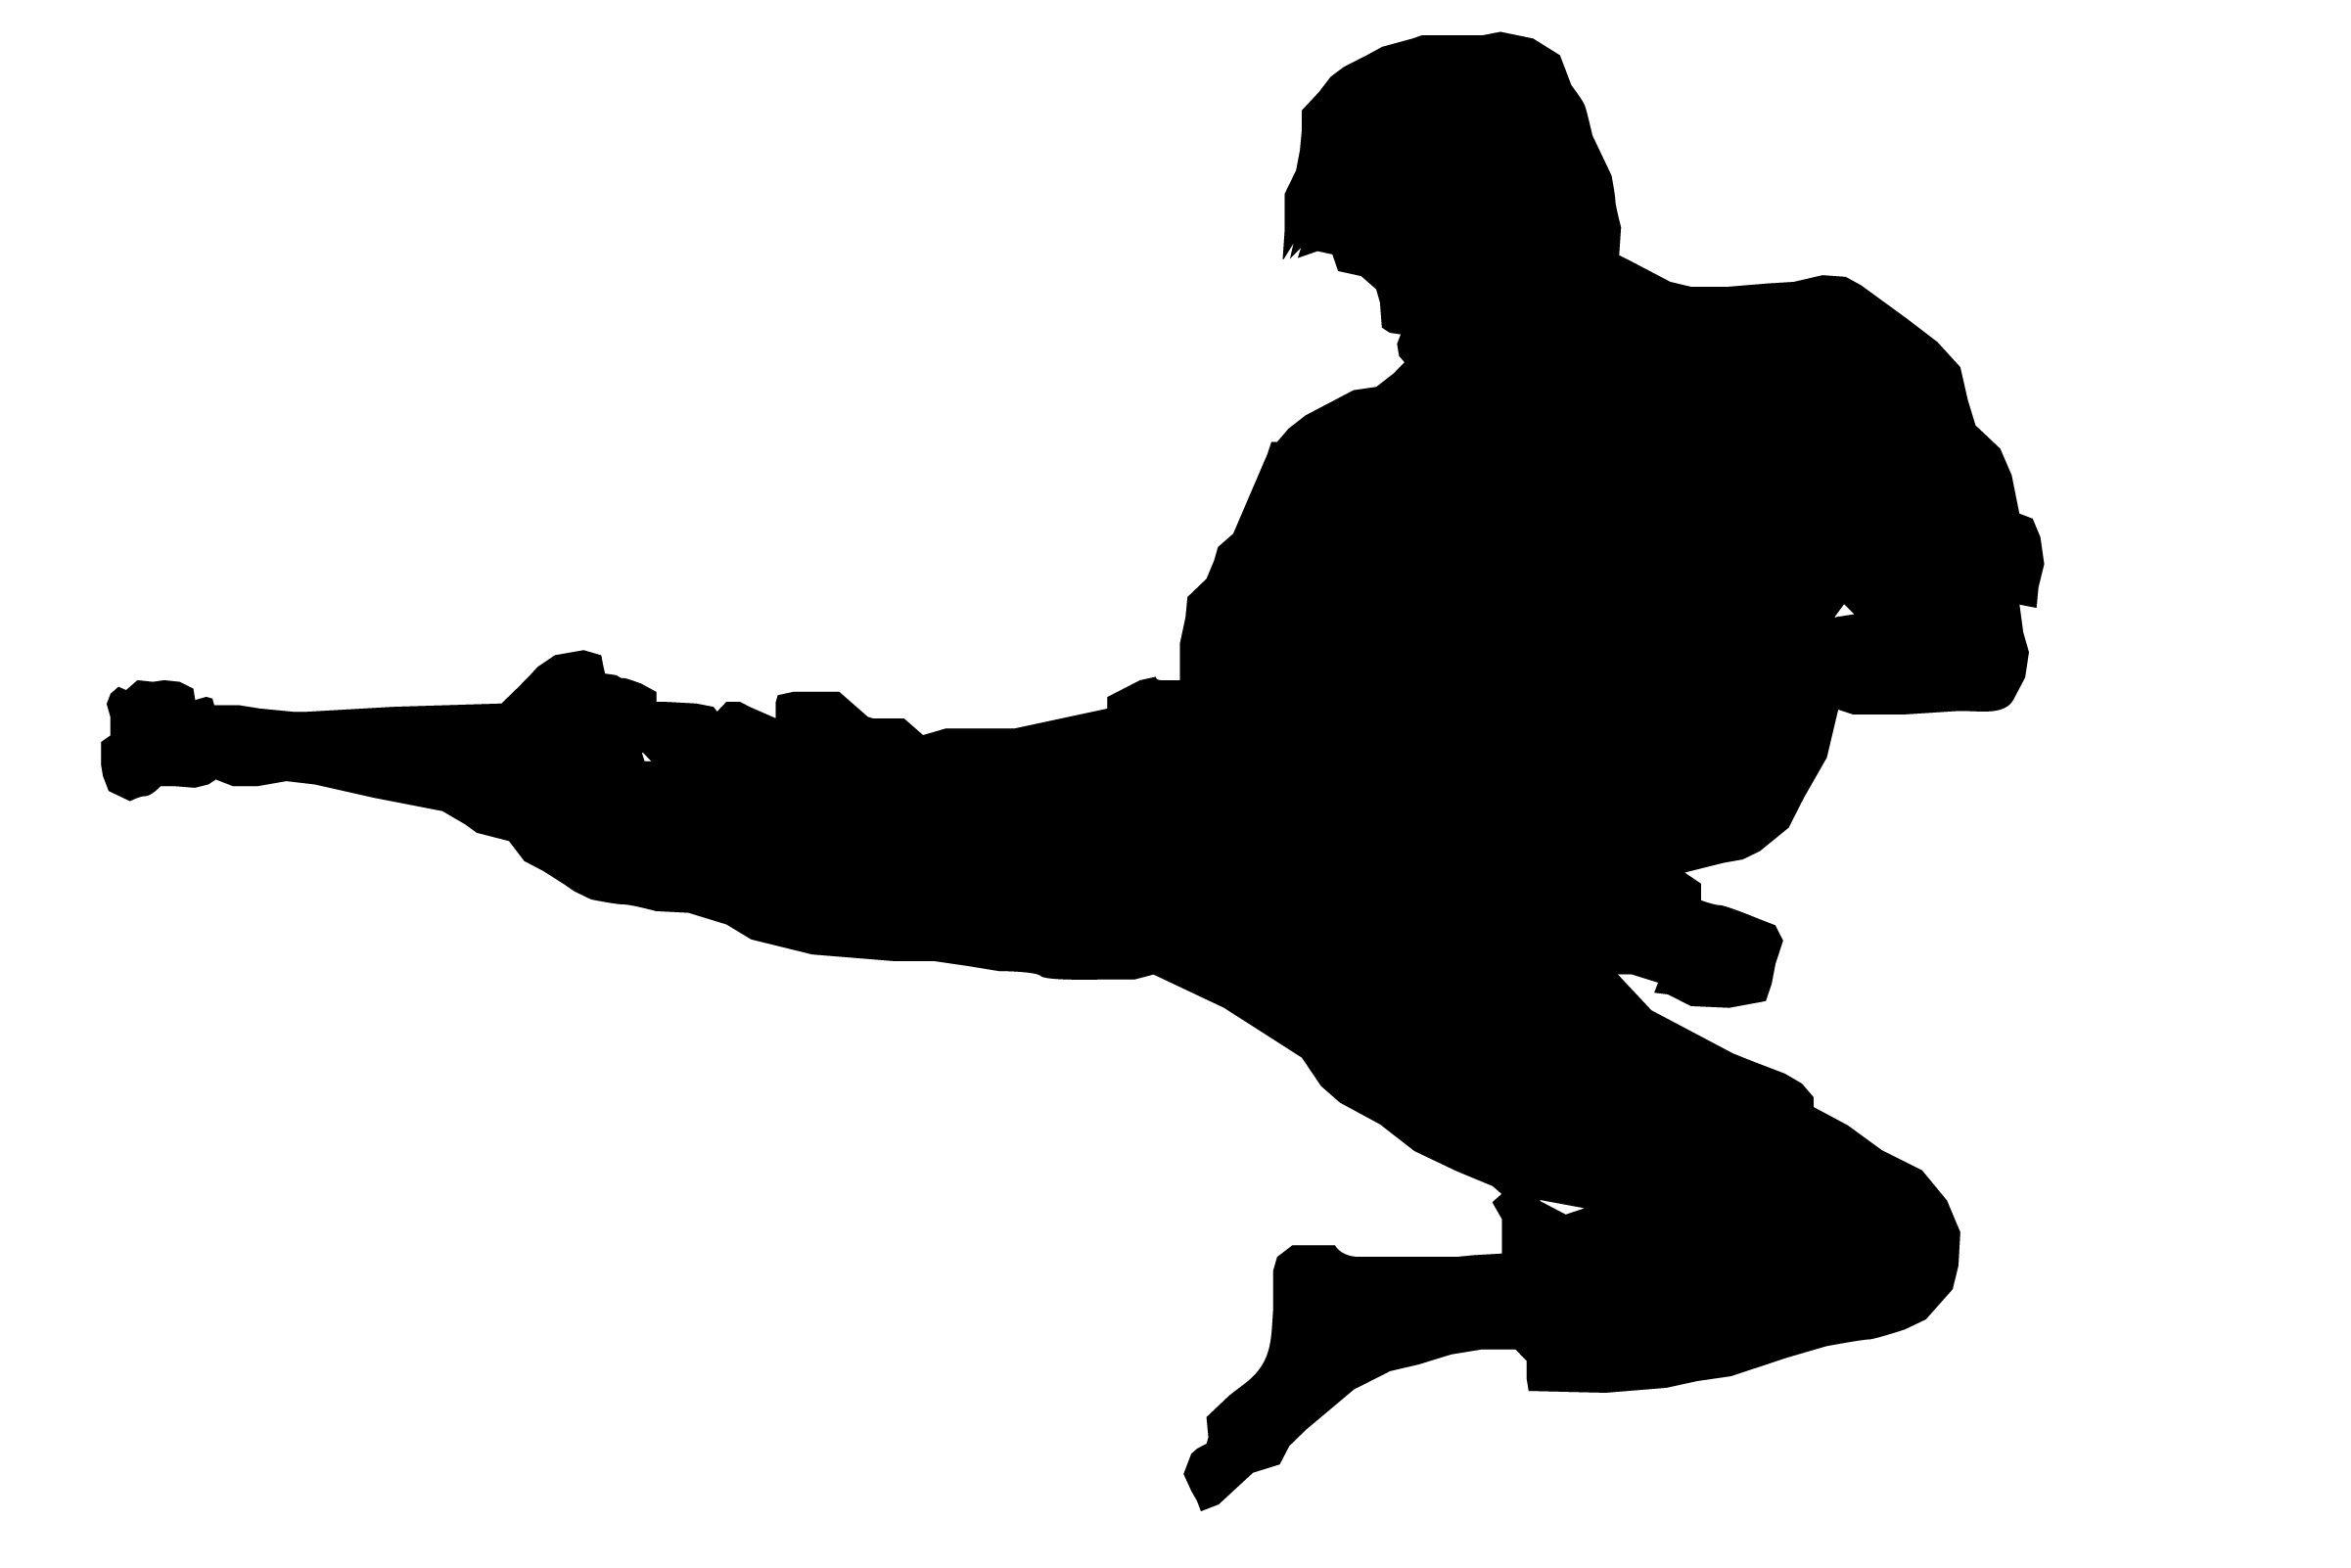 Karate Silhouette Clip Art Karate Demonstration | Cricut ideas ...